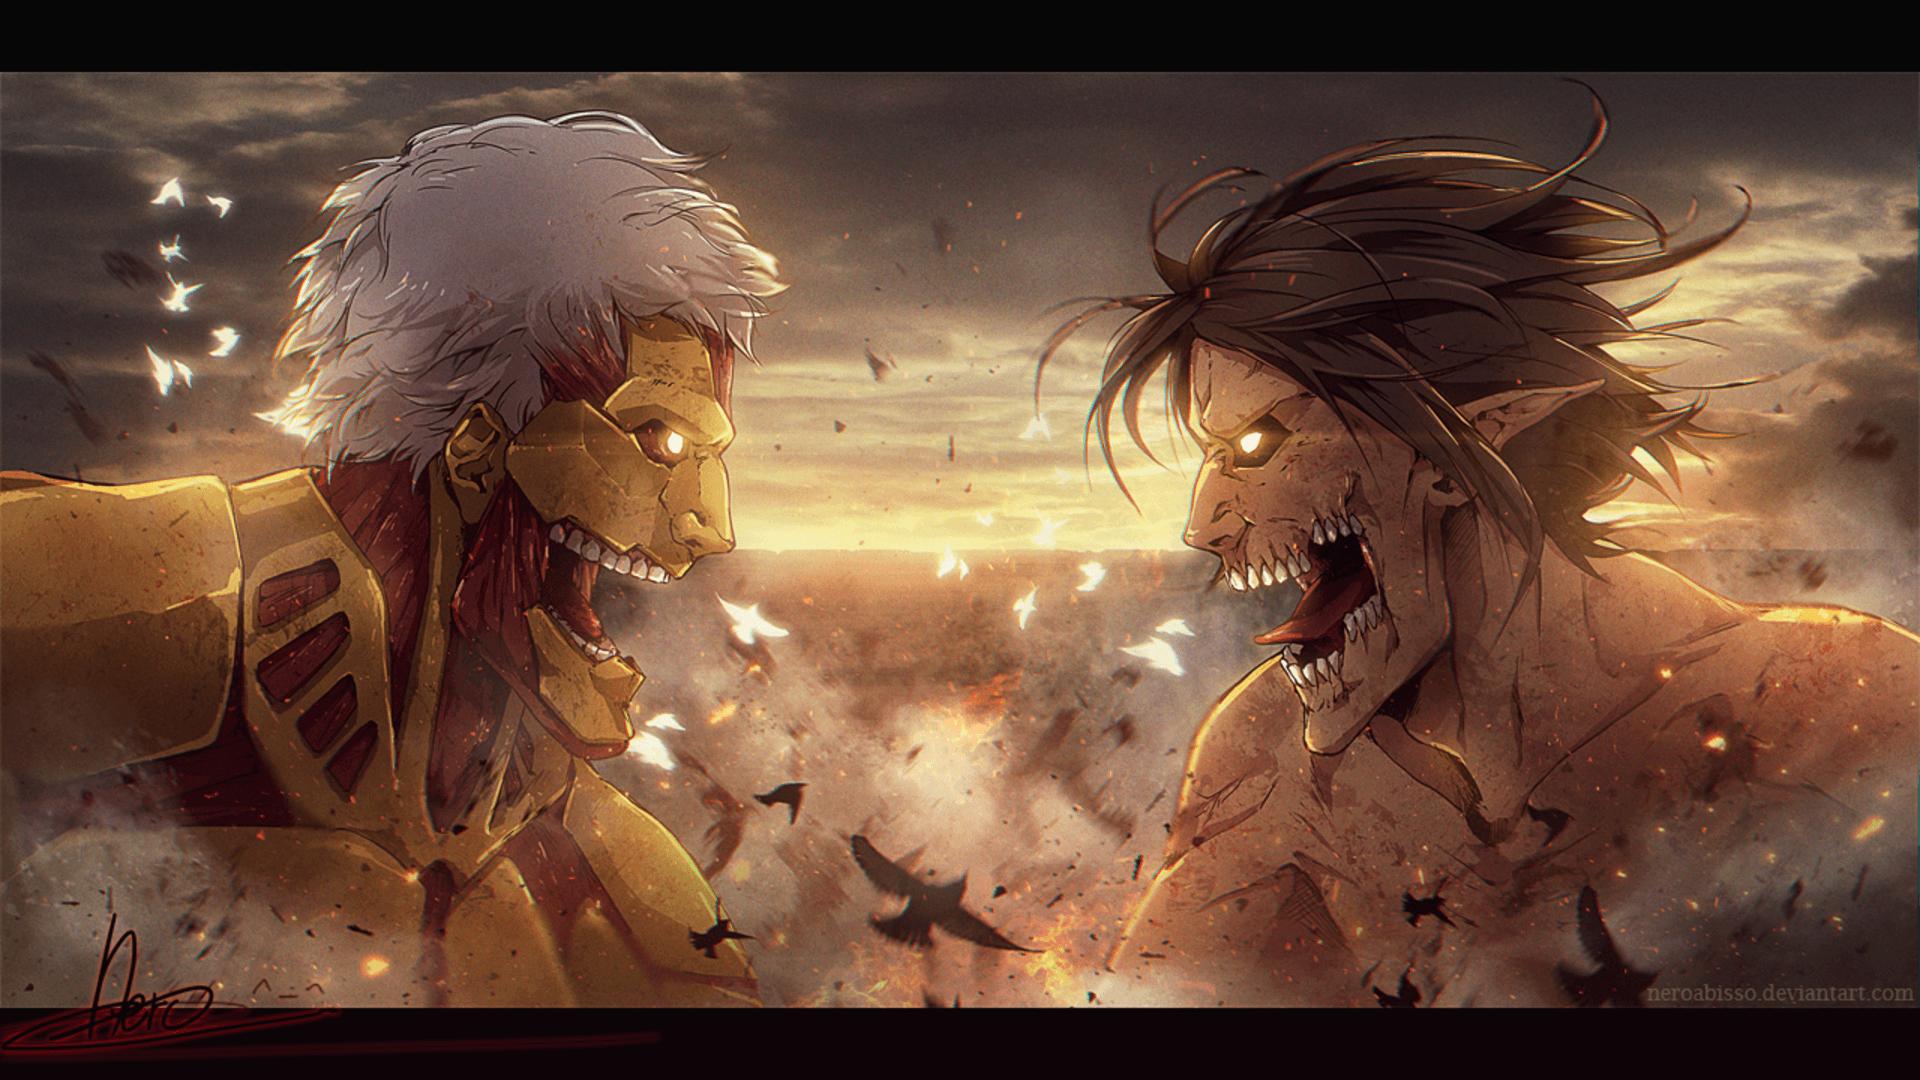 Levi and eren yeager attack on titan shingeki no kyojin 4k wallpaper 3840x2160. Titan Eren Berserk Wallpapers - Wallpaper Cave